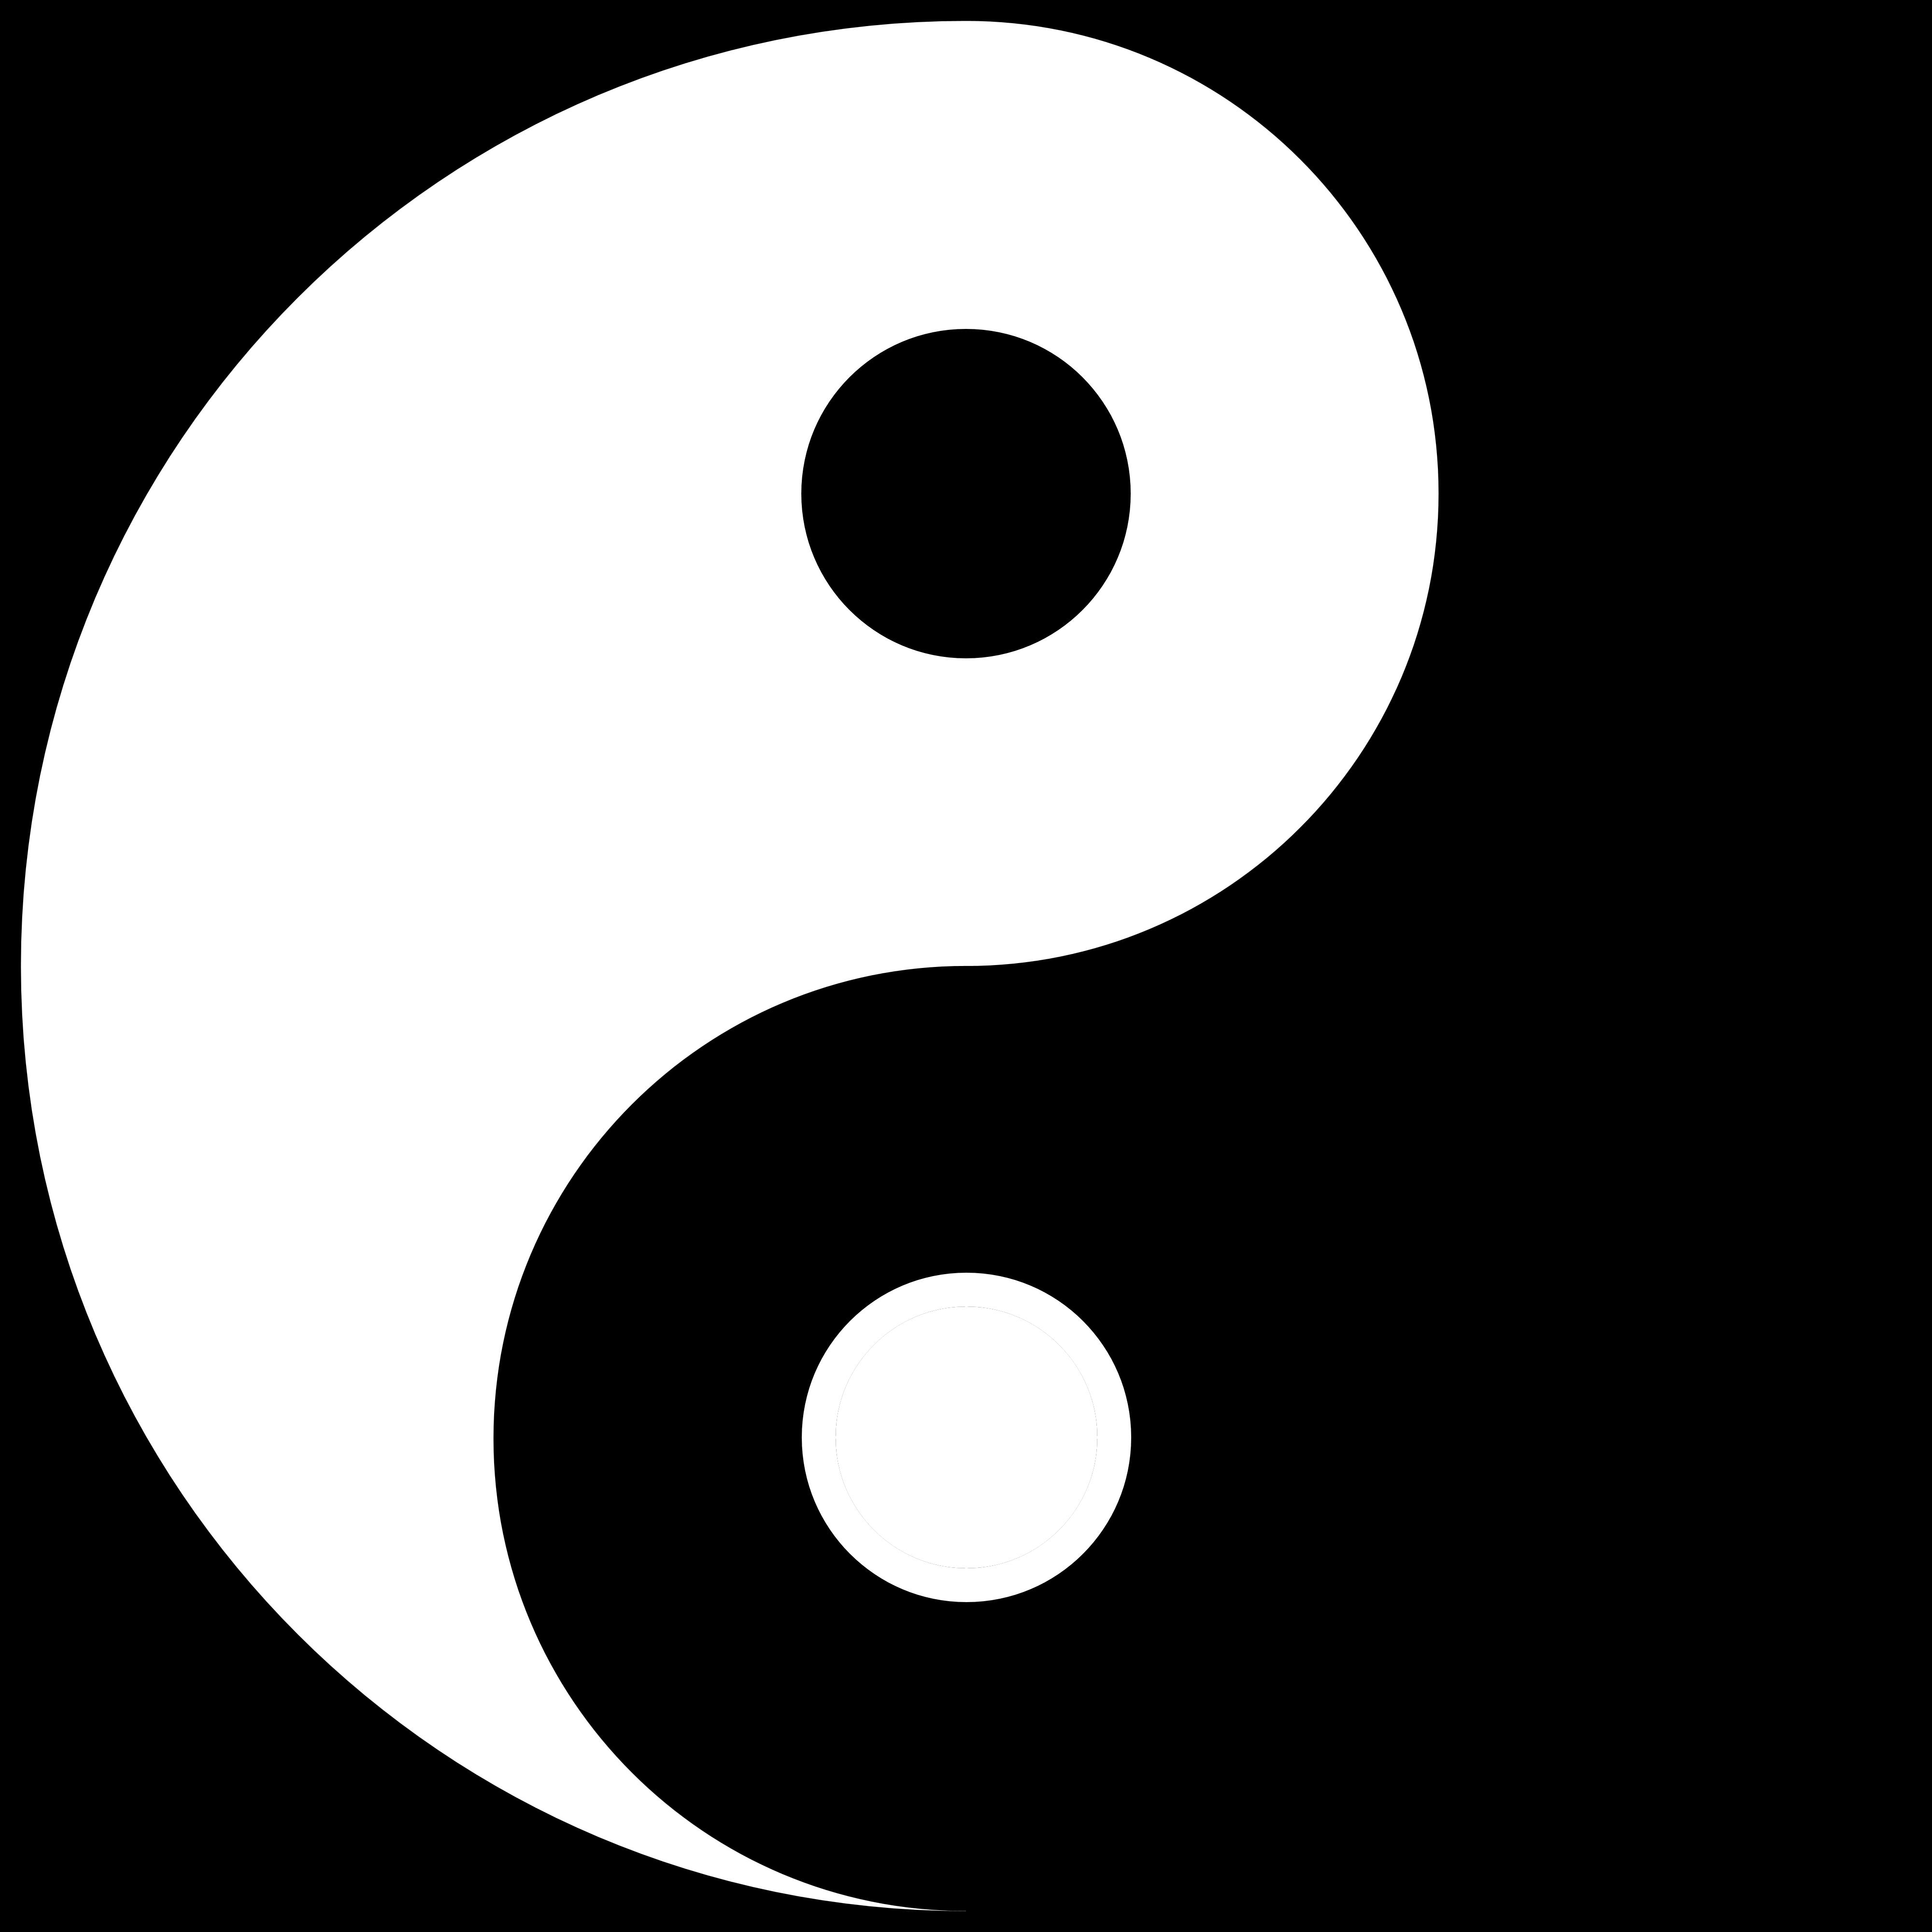 Символ инь и янь картинка